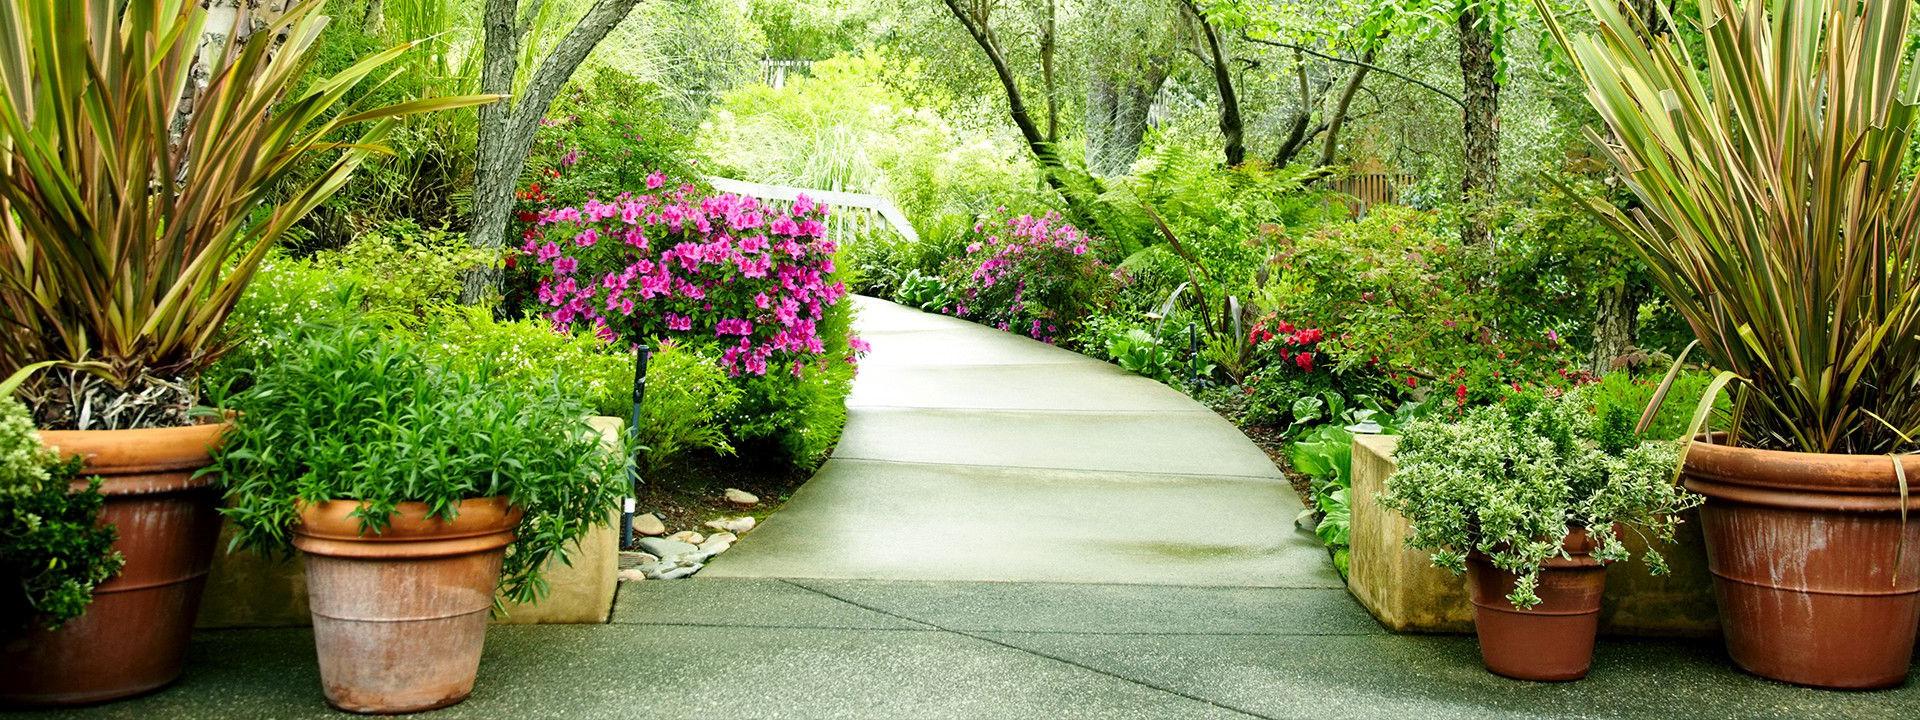 Resources   Gethsemane Cemetery and Memorial Gardens